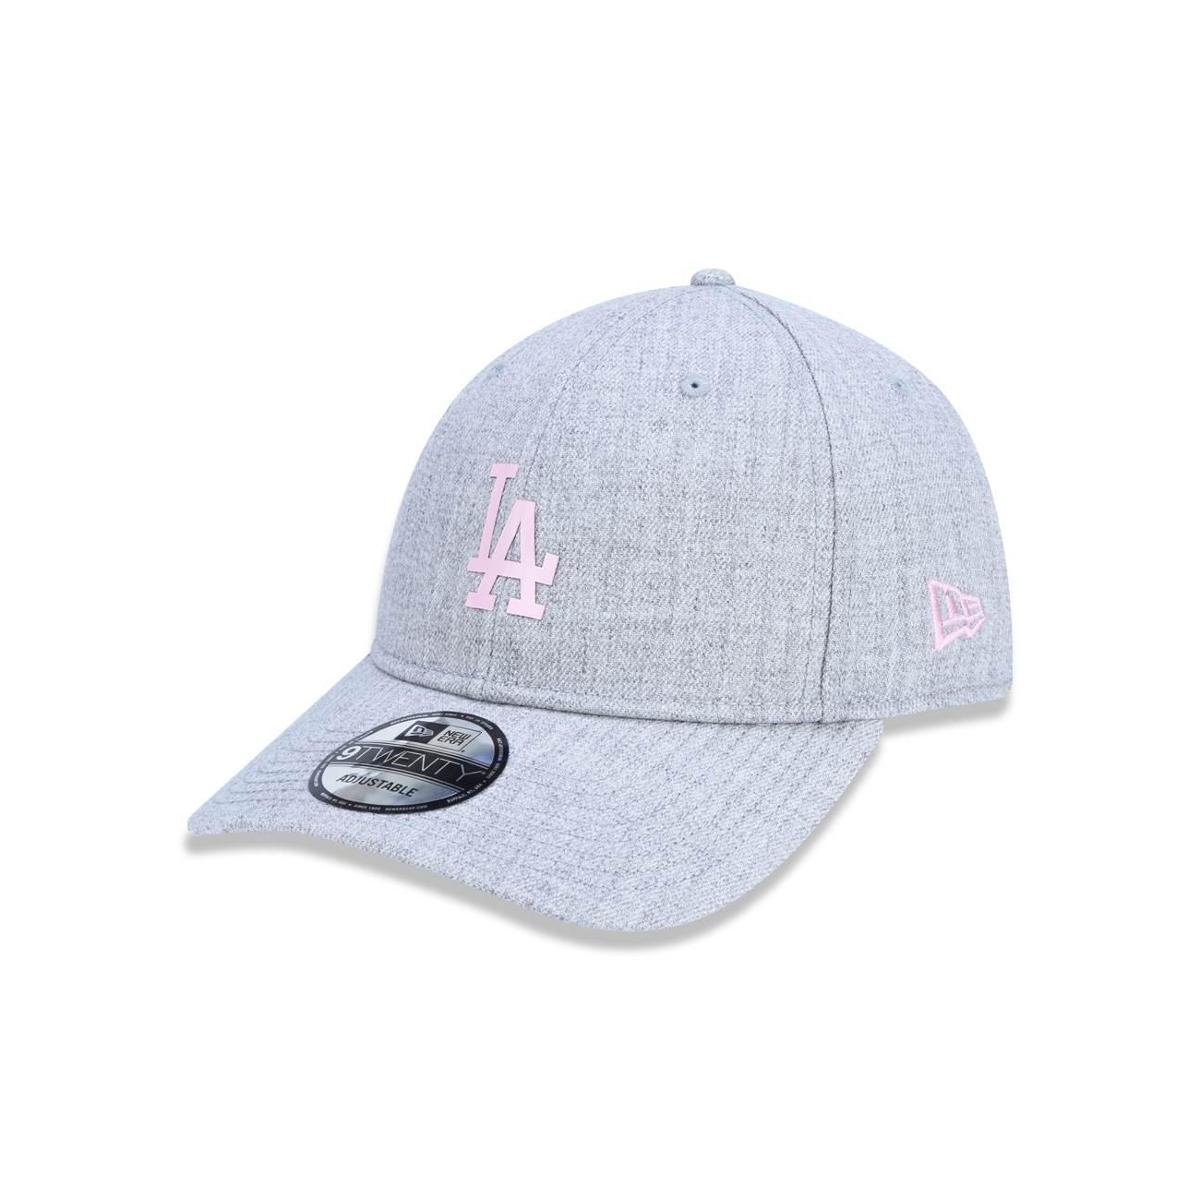 ... Aba Curva Strapback Cinza Pink New Era Ver mais. Permaneça conectado. Bone  920 Los Angeles Dodgers MLB New Era ... 2726add5088